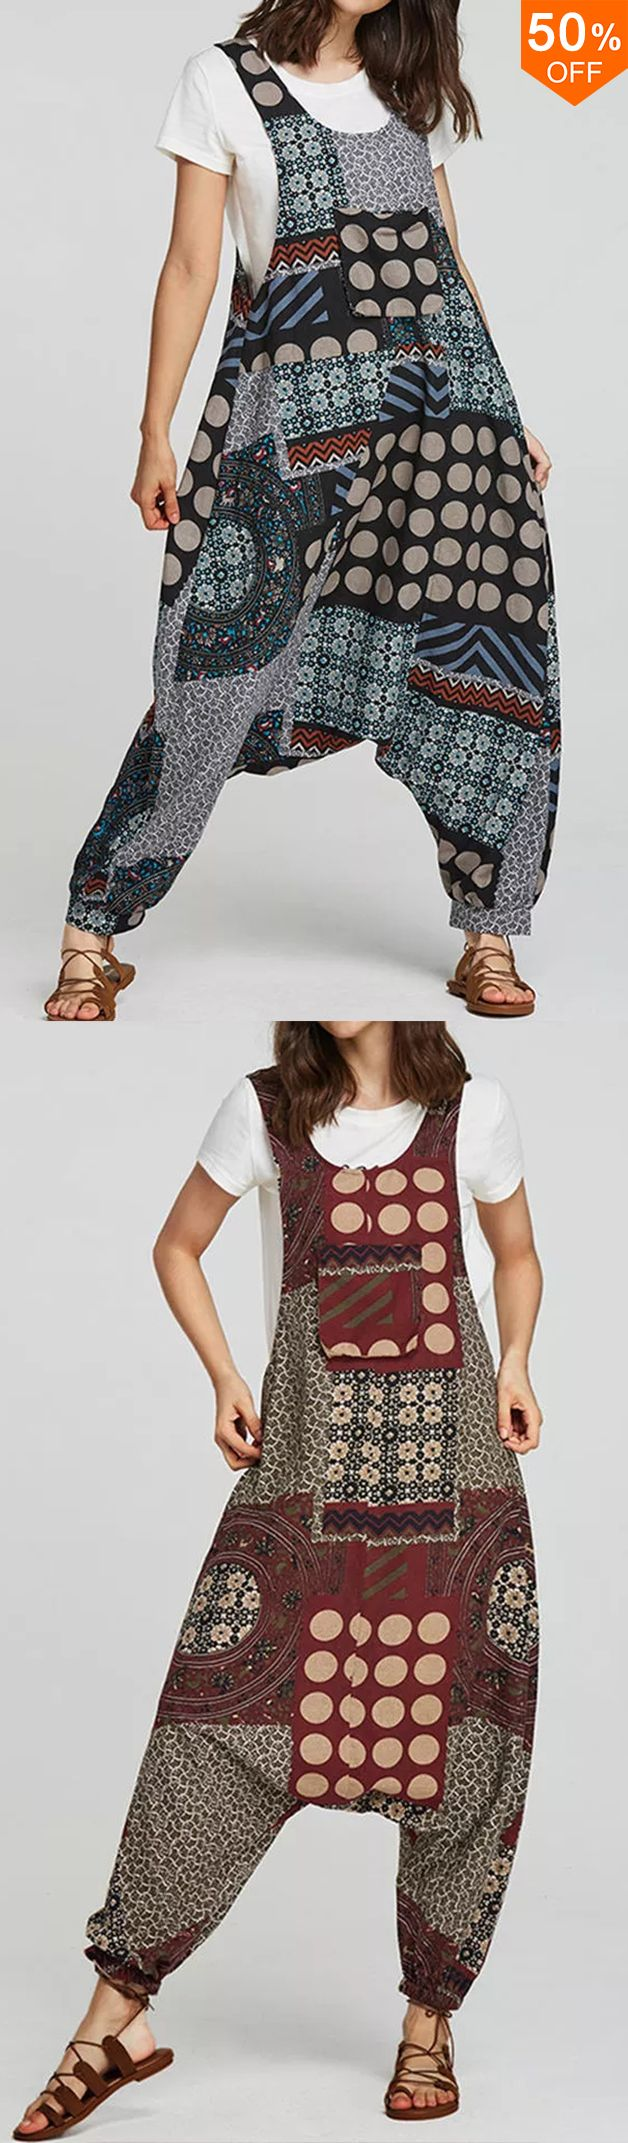 Women Ethnic Cotton Print Overall Side Pockets Harem Romper Jumpsuit #jumpsuitromper